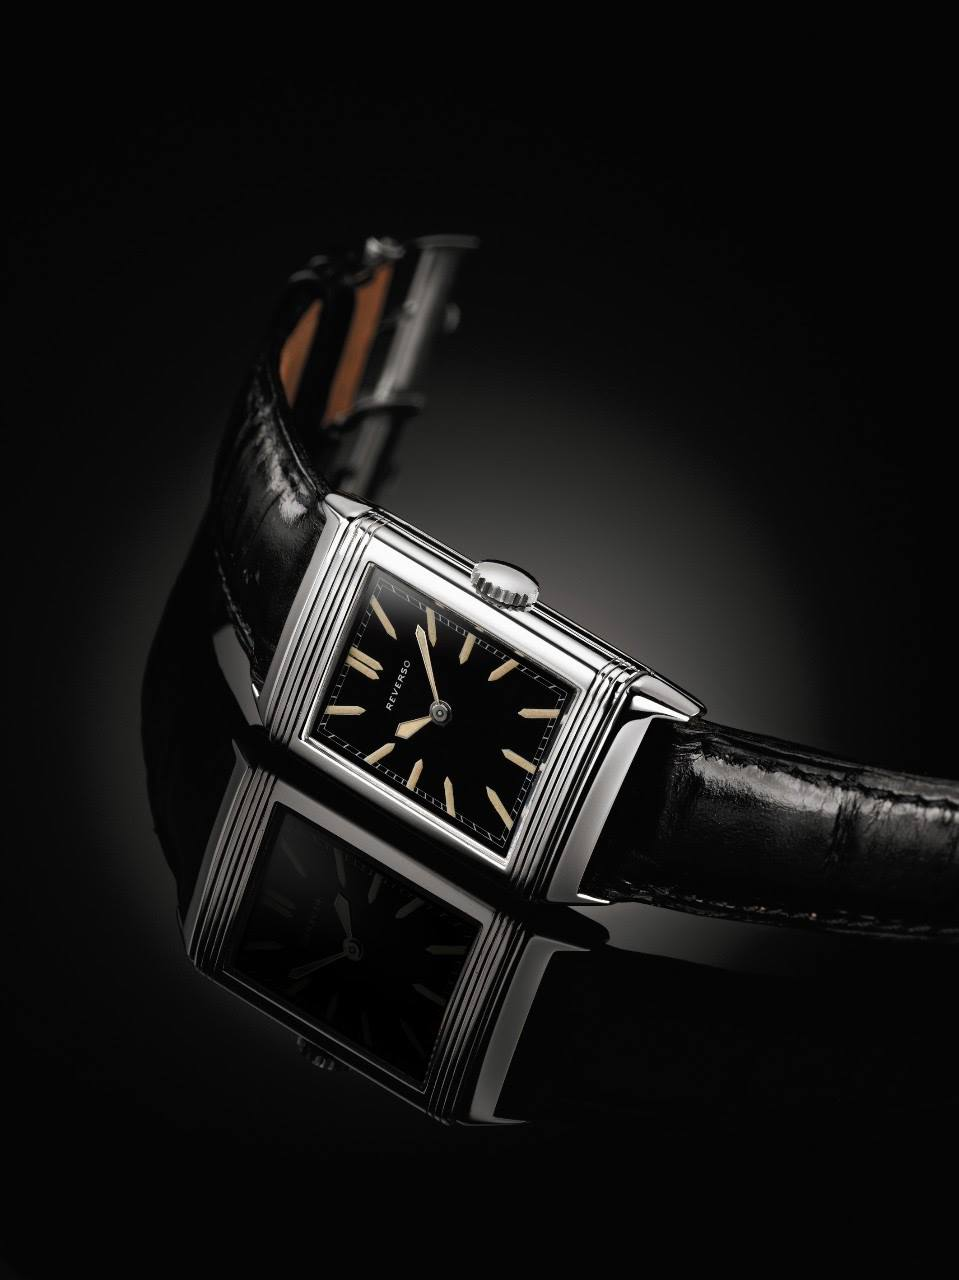 Jaeger-LeCoultre Reverso 1931-80 anos